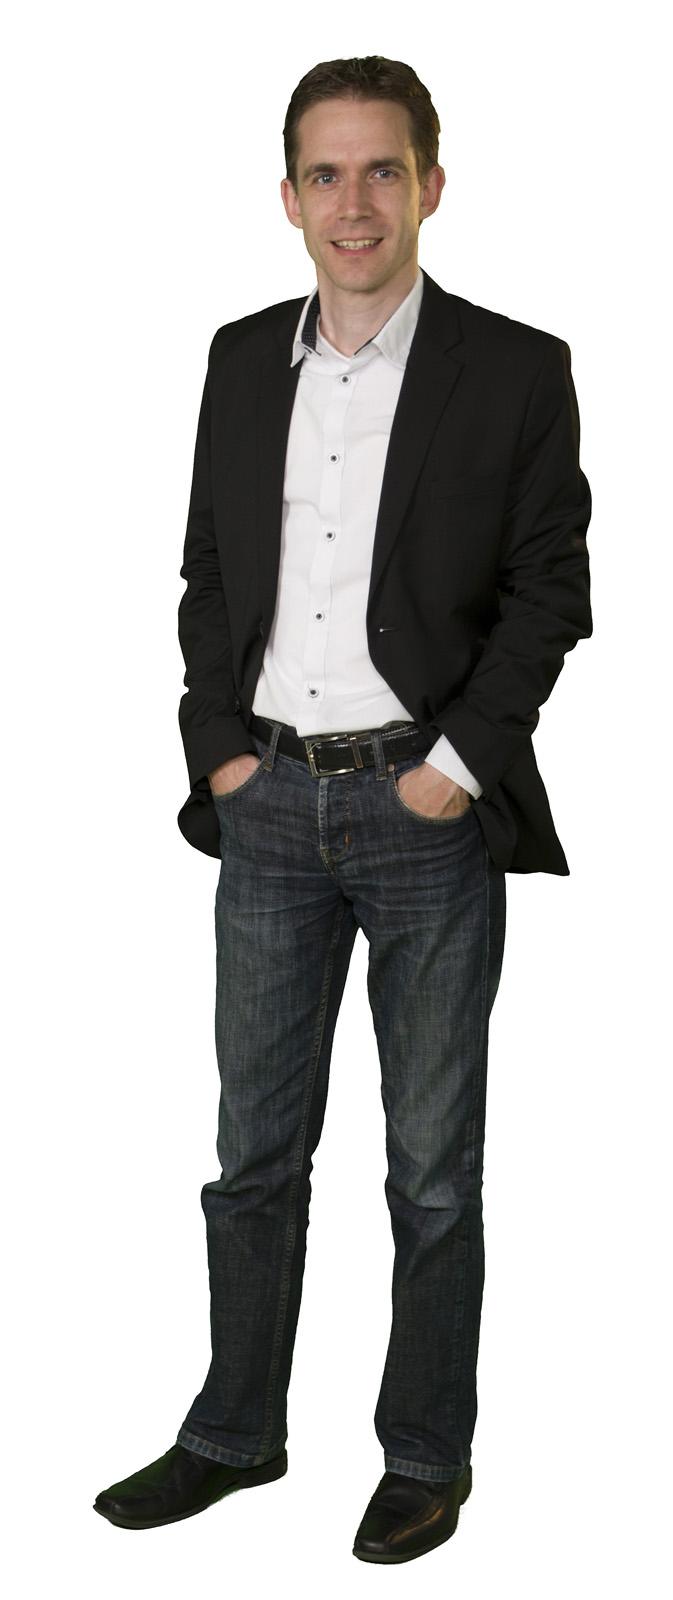 ing. P.J. (Johan) van der Graaf